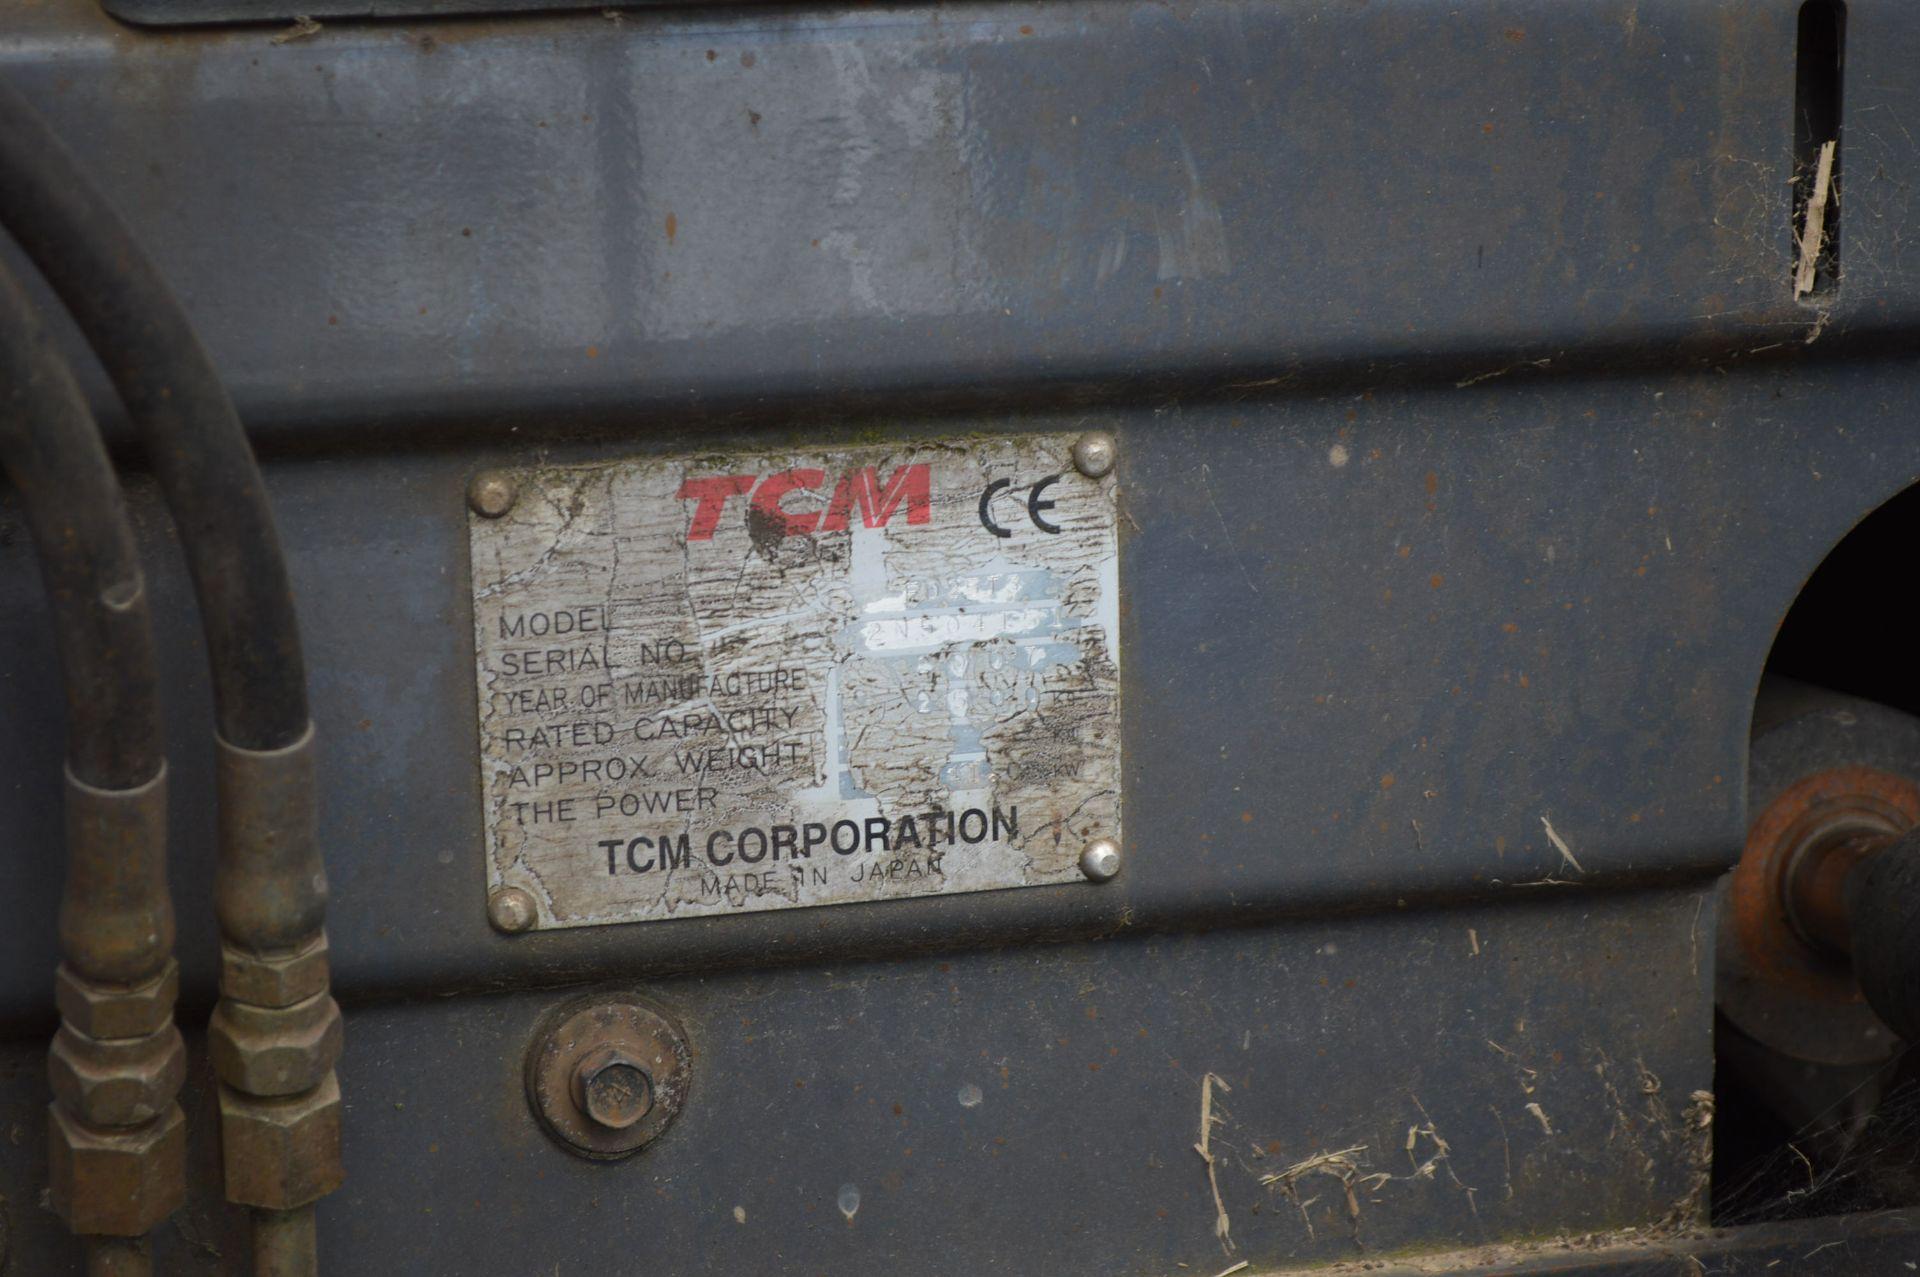 2007 TCM FD25T3 FORKLIFT, 2500KG RATED CAPACITY *PLUS VAT* - Image 4 of 8